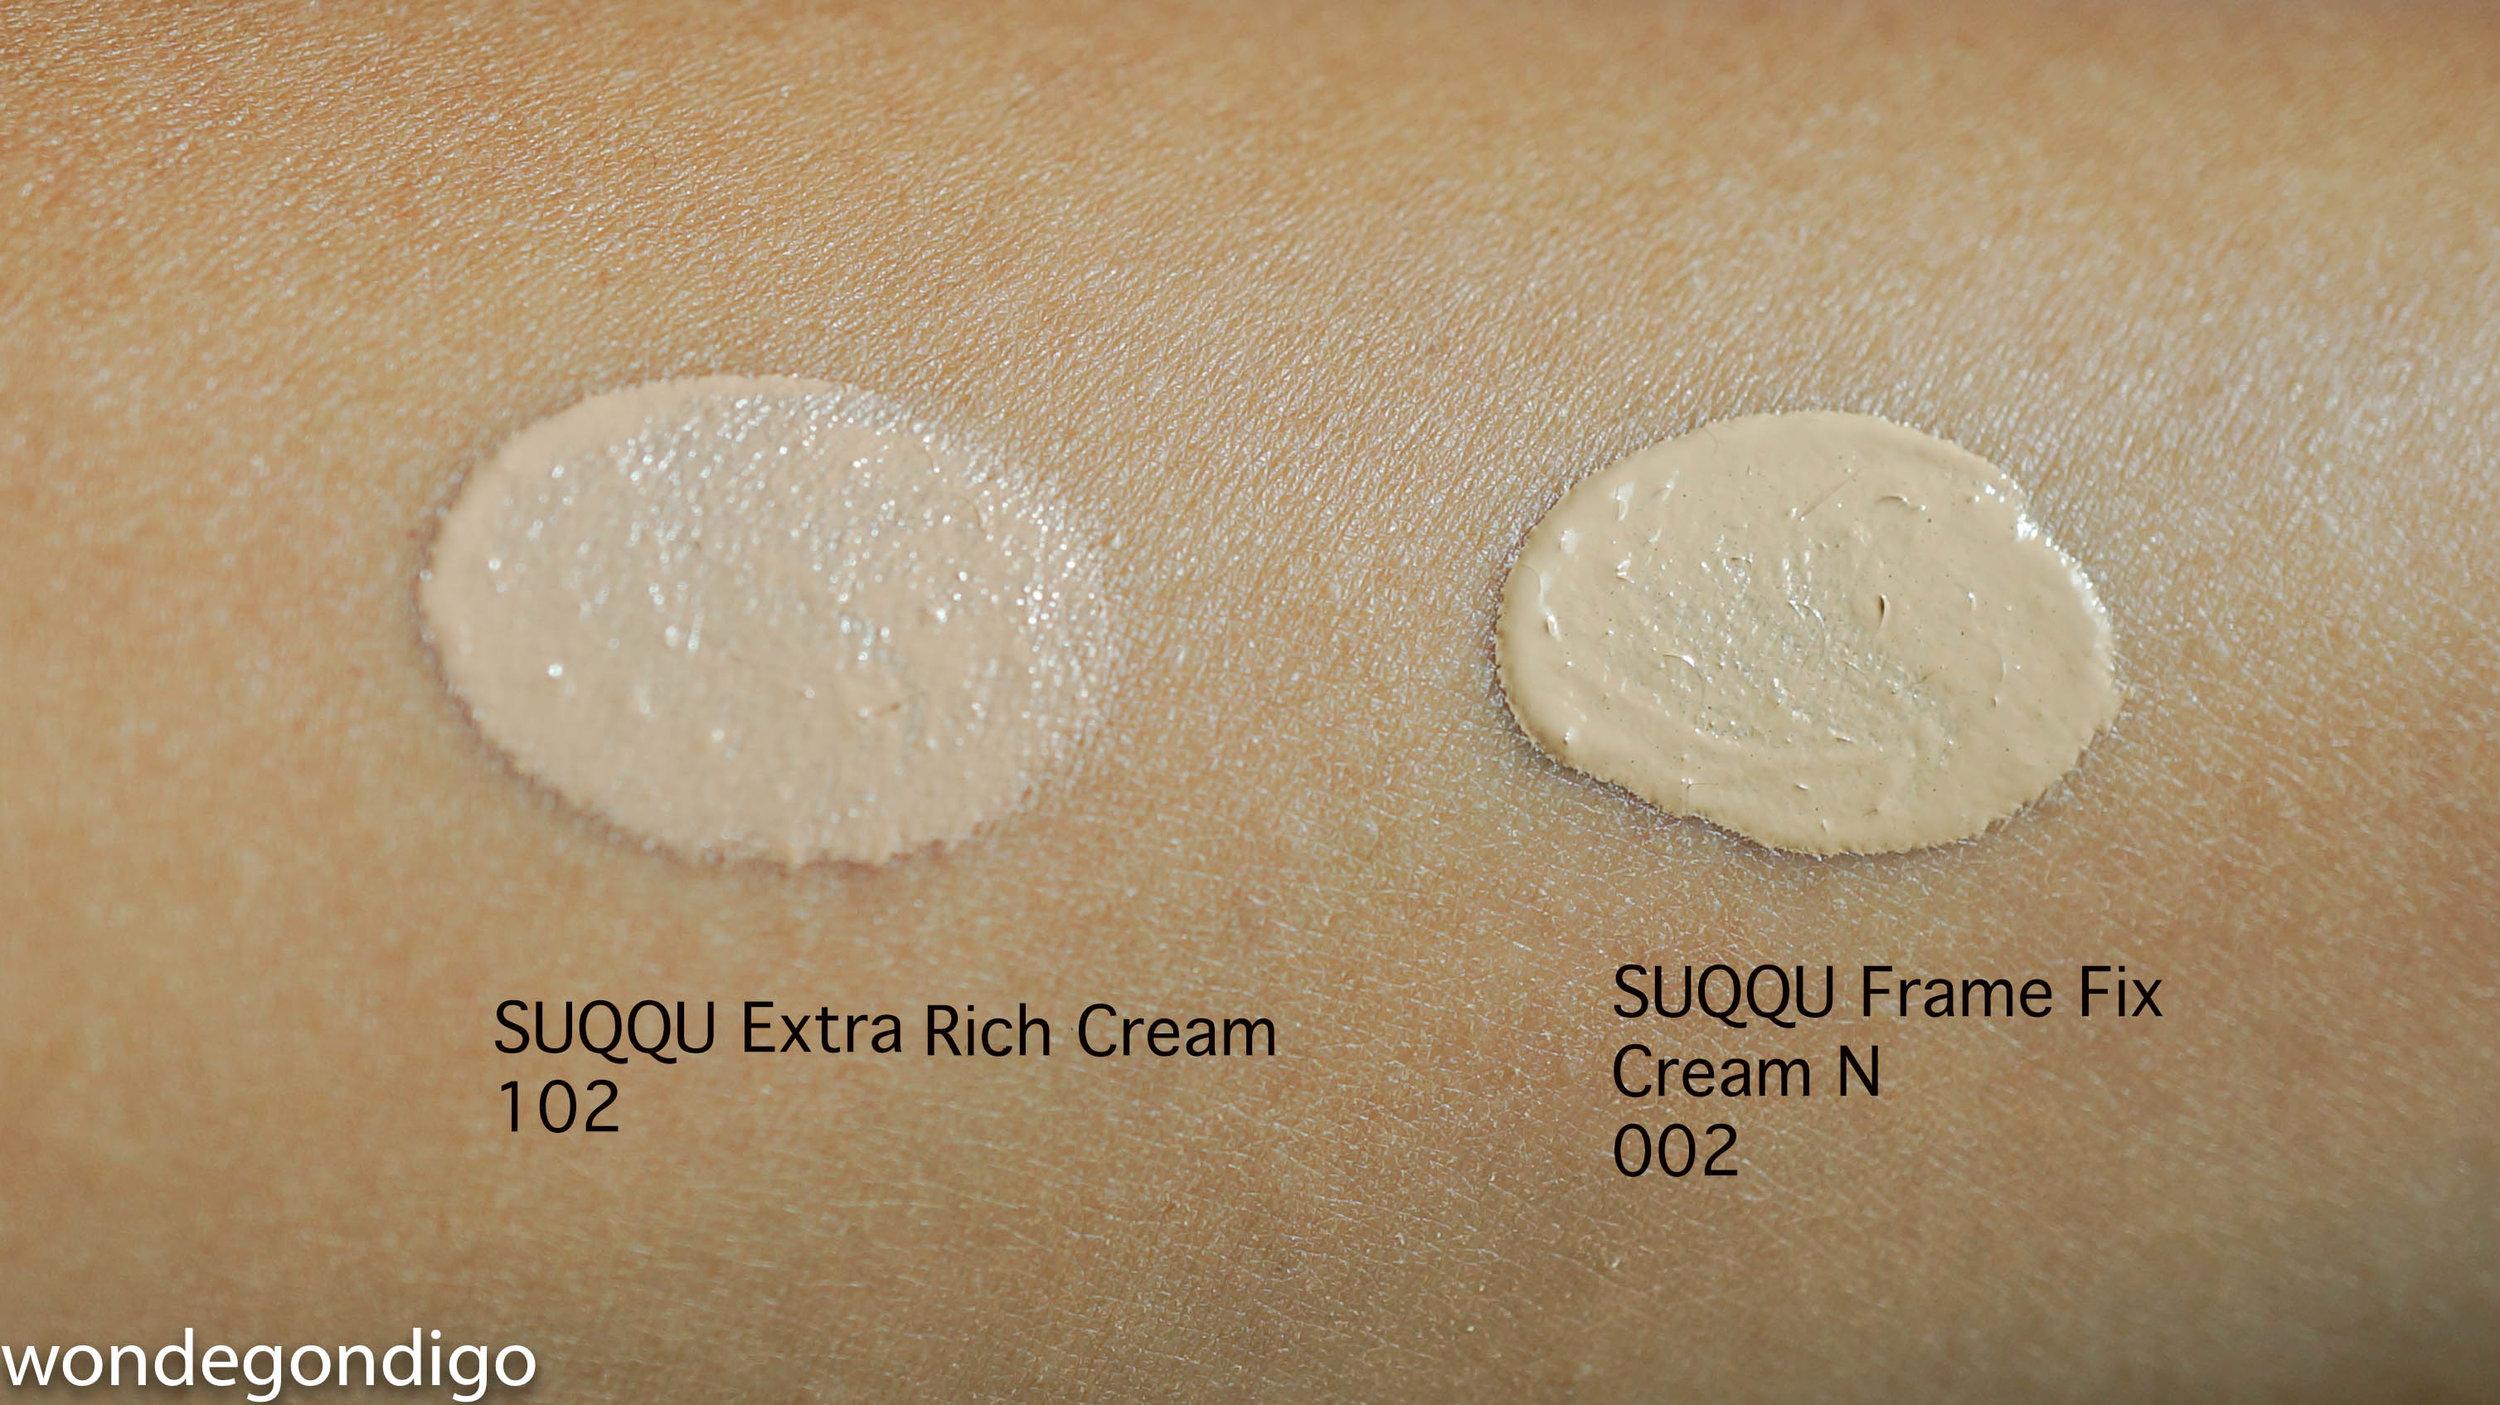 SUQQU Extra Rich Cream Foundation Shade 102 & SUQQU FFCN Foundation Shade 002